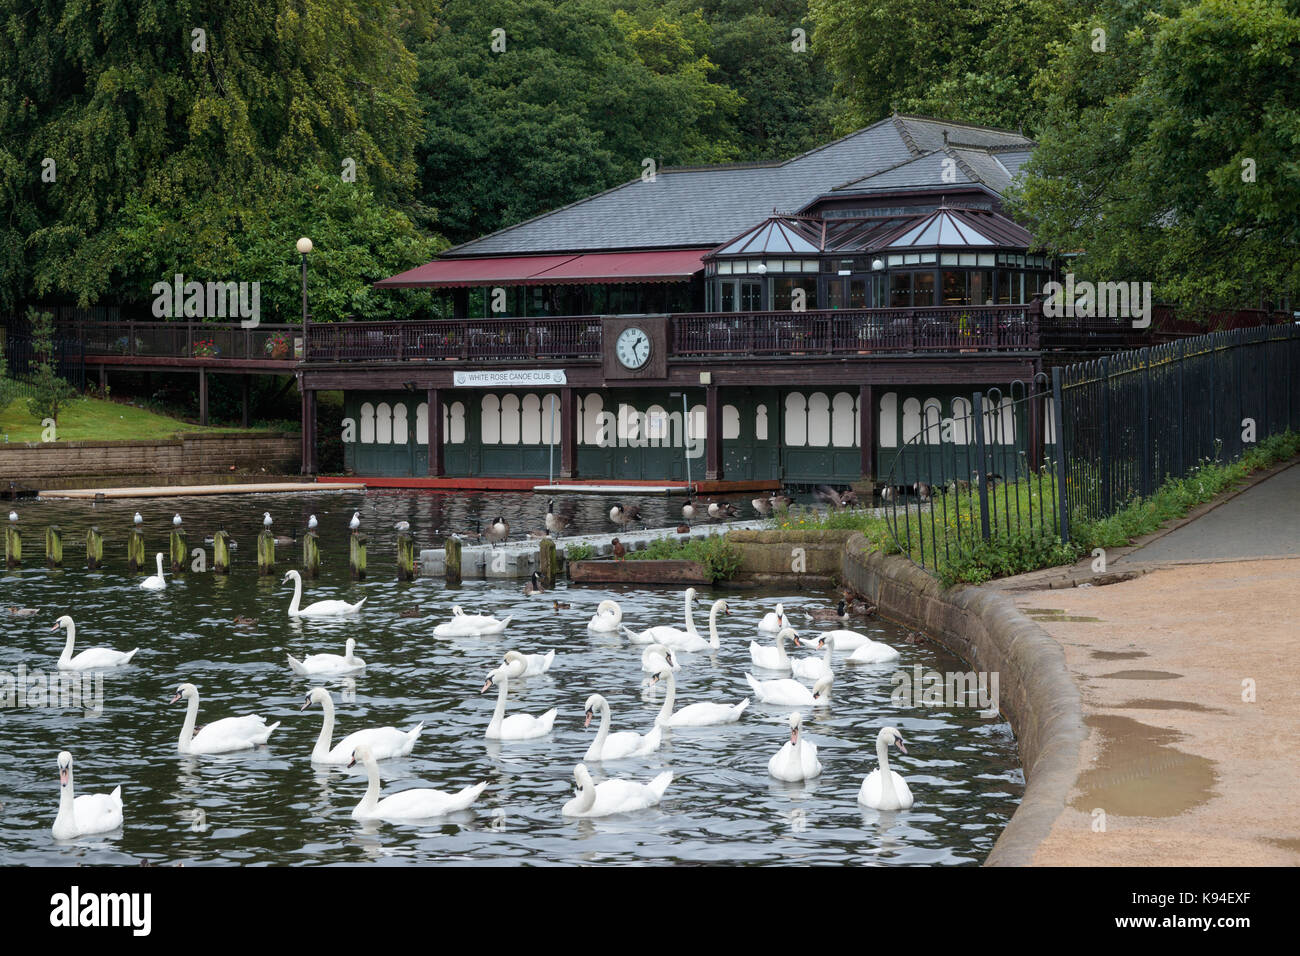 Swans and ducks on Waterloo Lake, Roundhay Park, Leeds Stock Photo